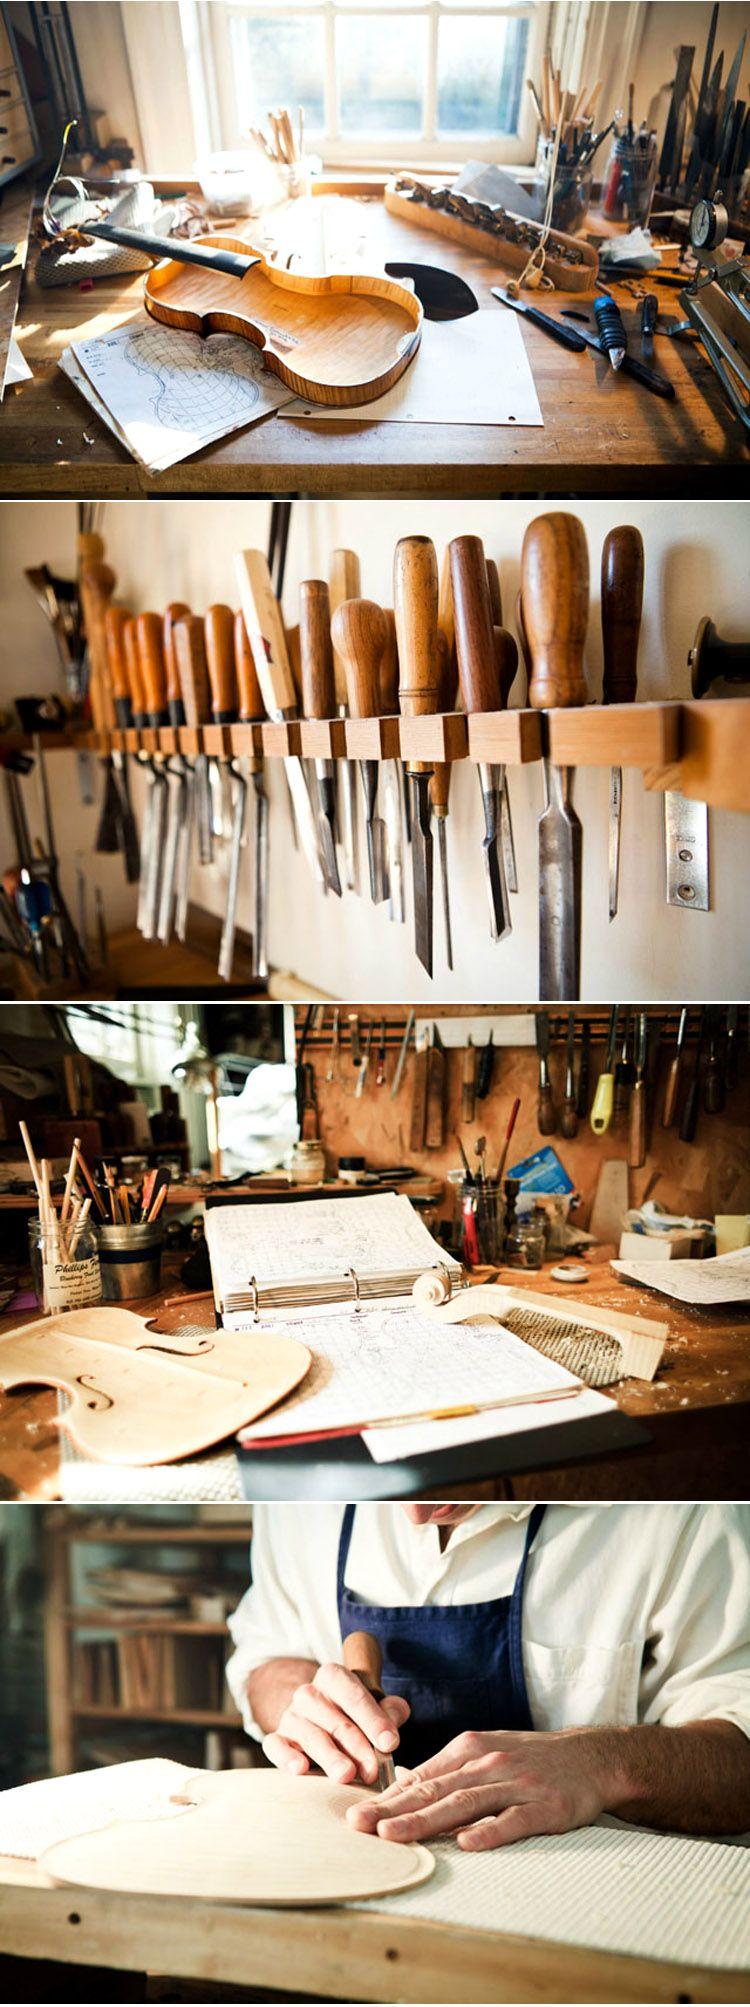 Violin Maker Sam Zygmuntowicz's workshop http://honestlywtf.com/rarebirds/the-violin-maker/